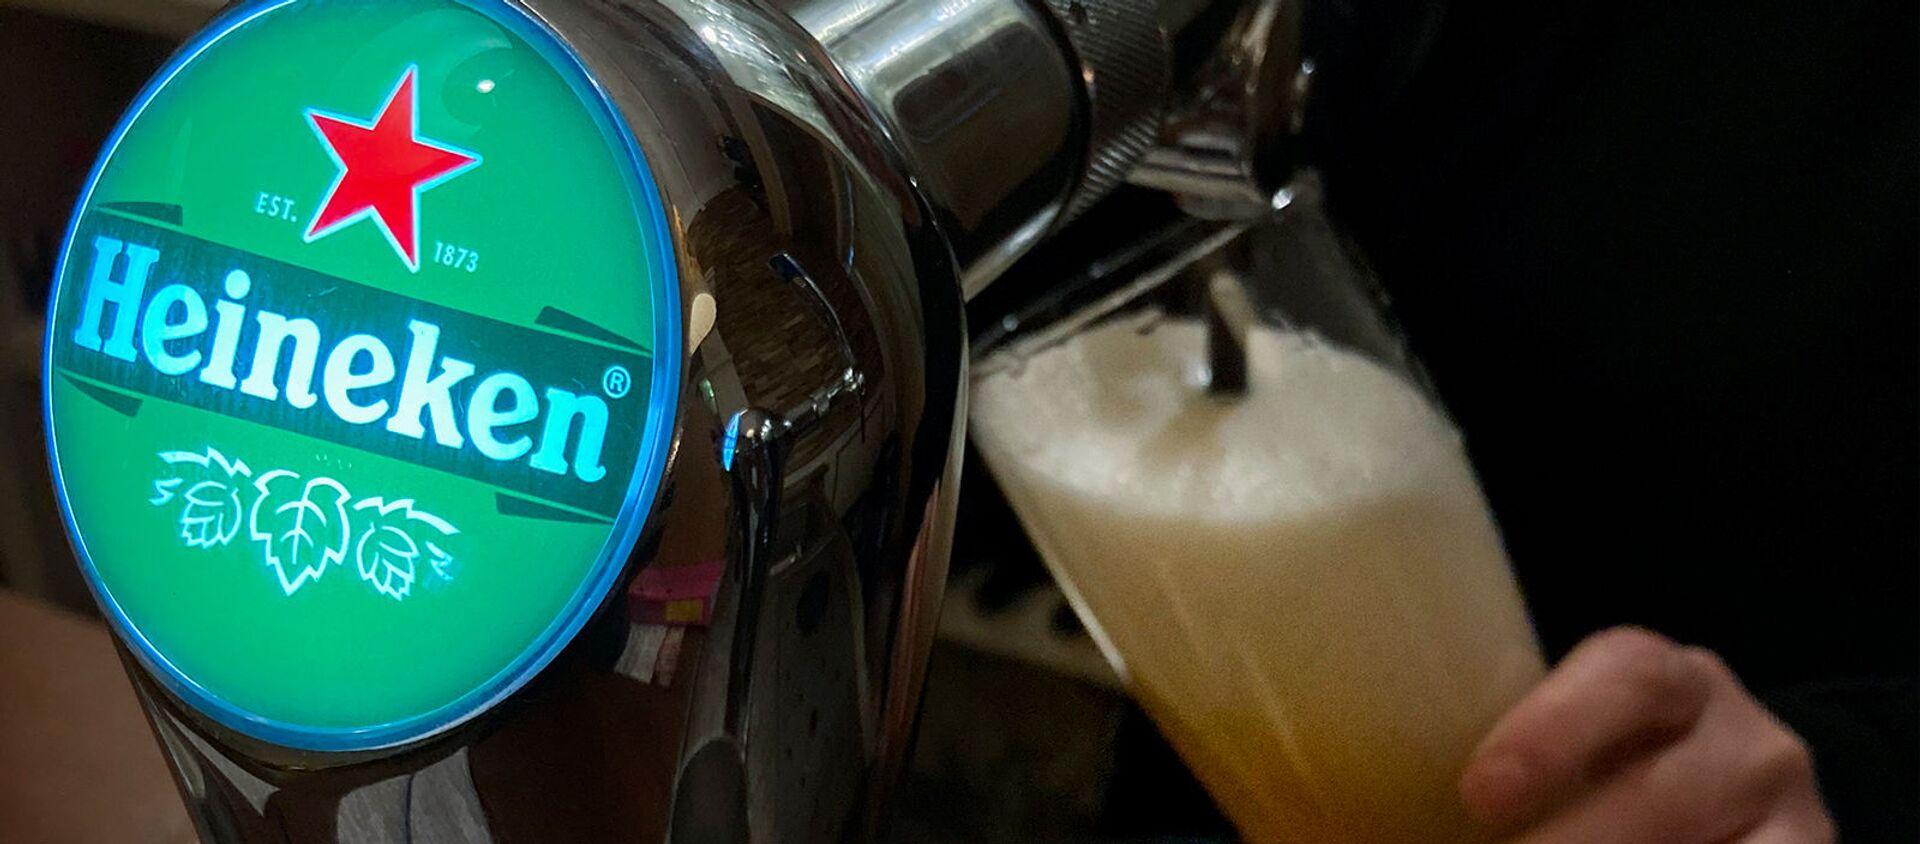 Бармен разливает пиво Heineken в Олдеберкупе - Sputnik Արմենիա, 1920, 15.06.2021